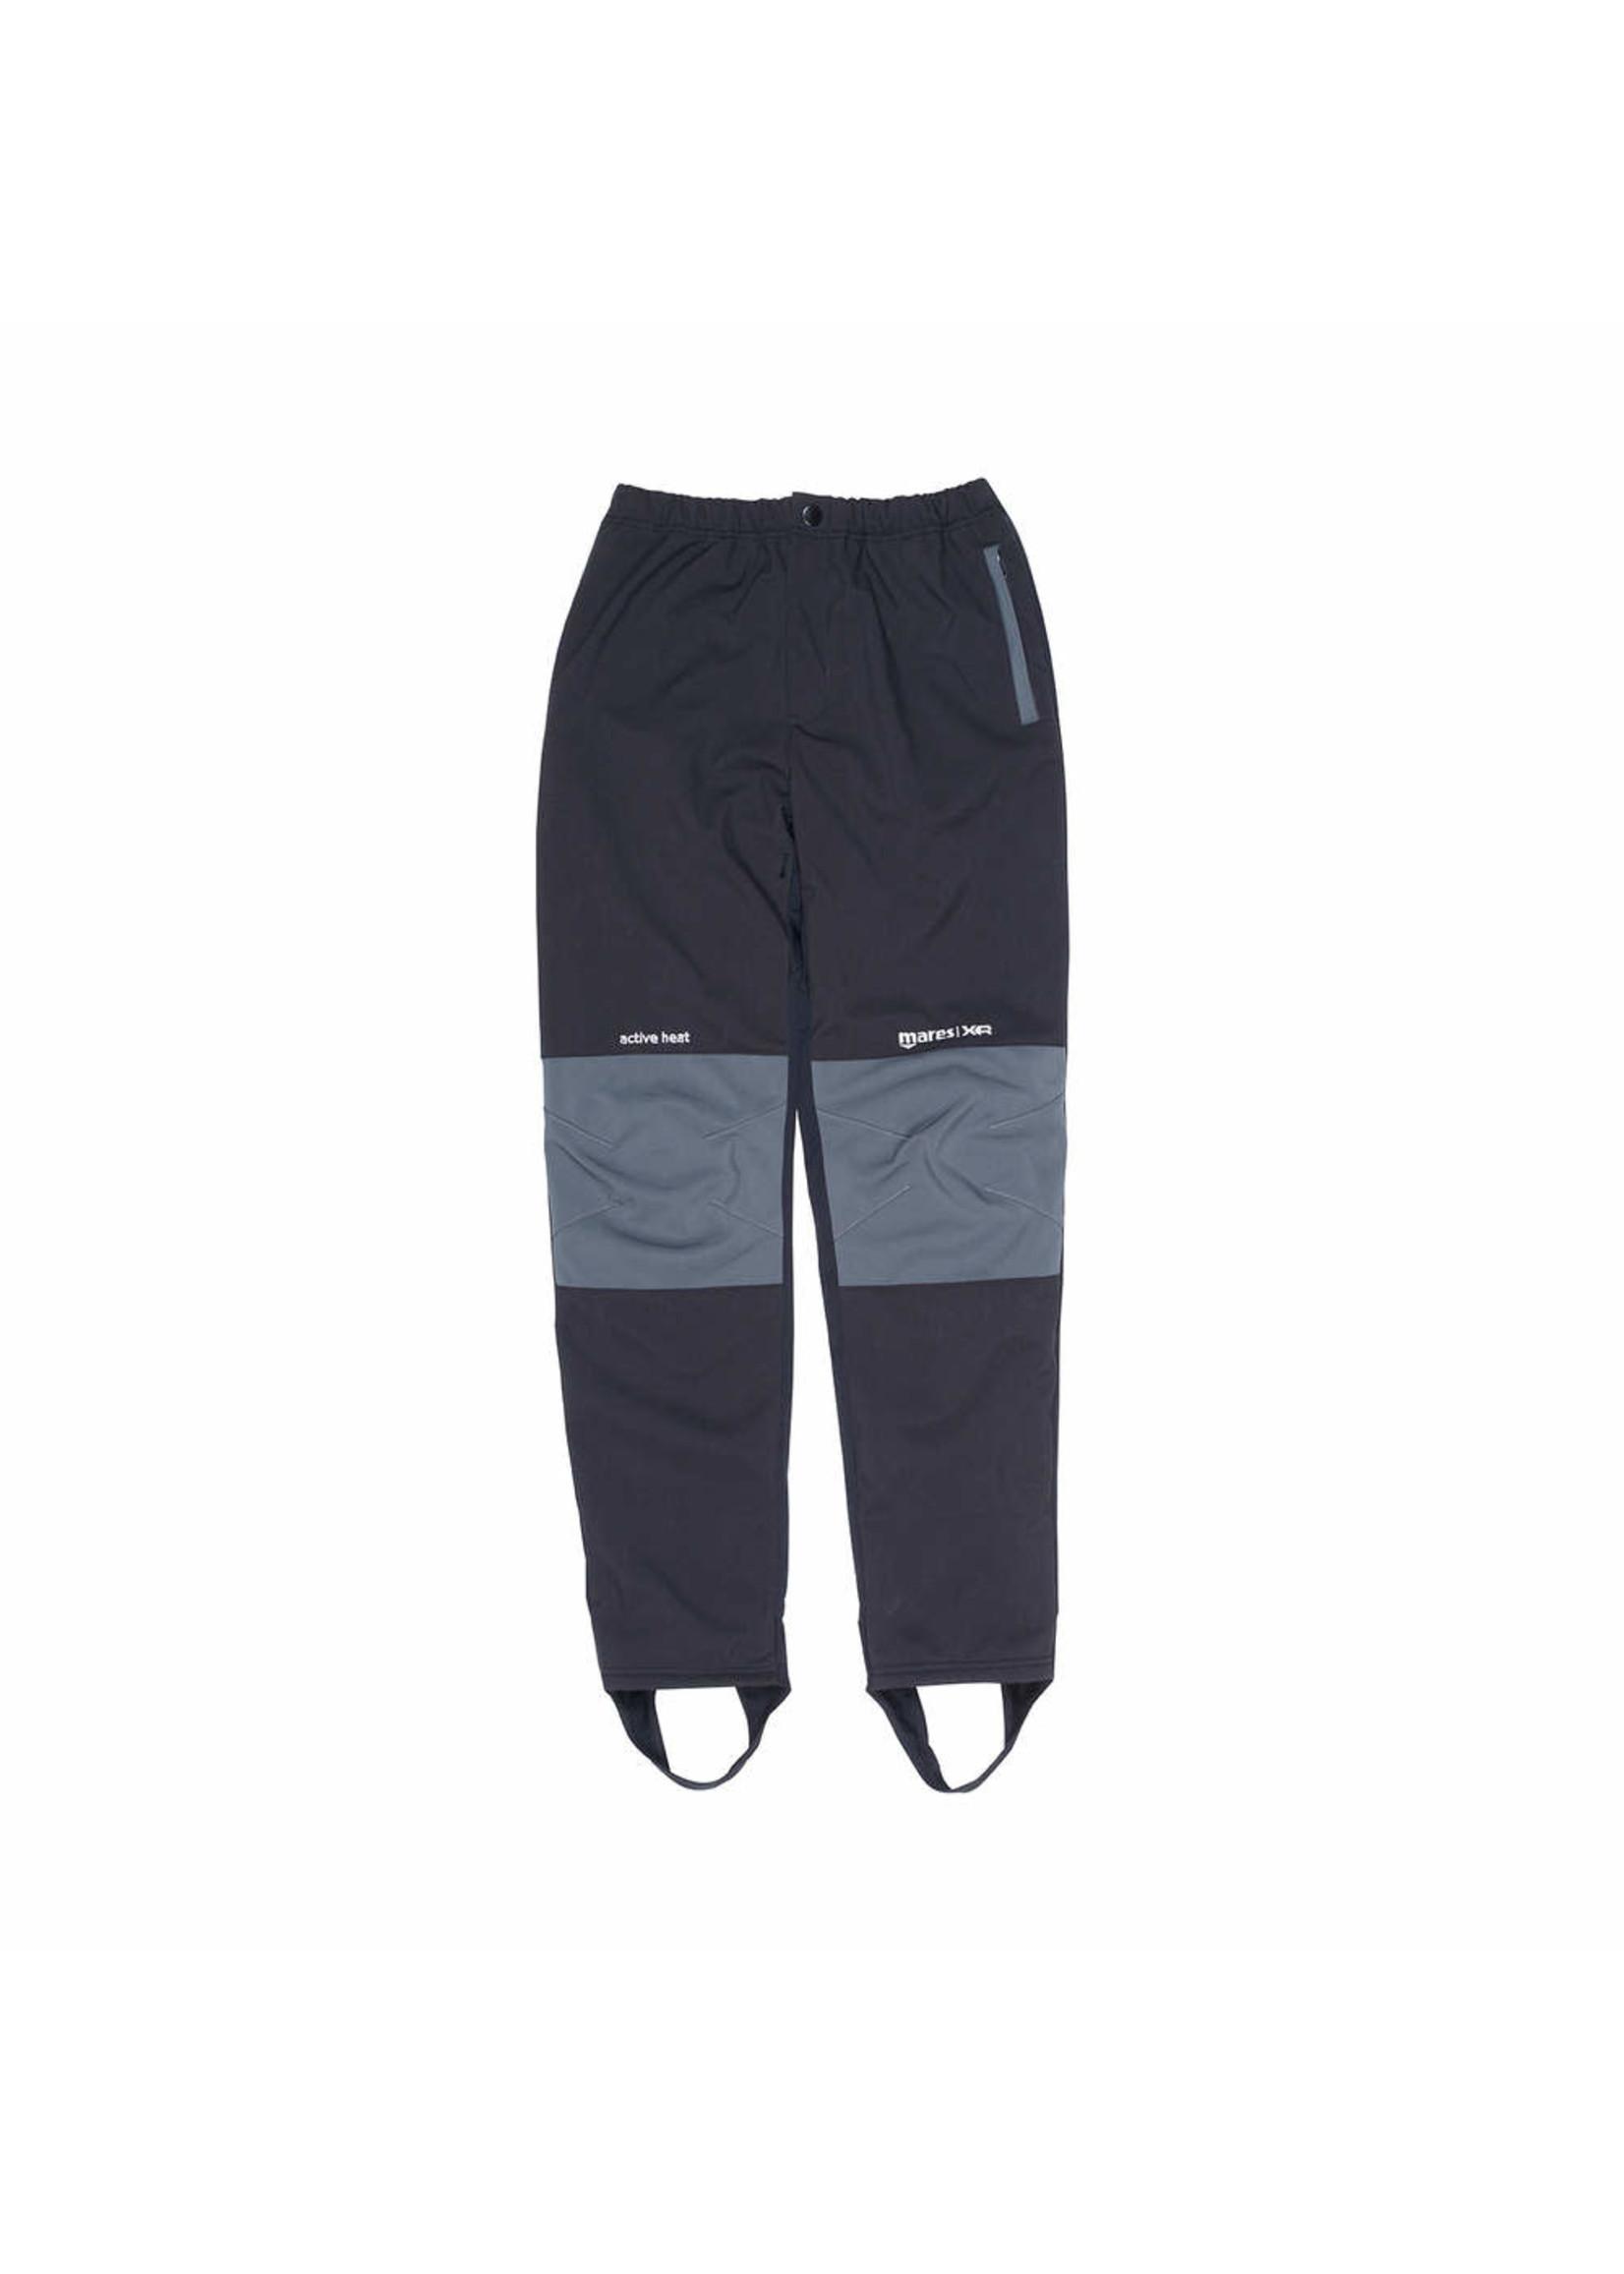 Mares Mares Active Heating Pants